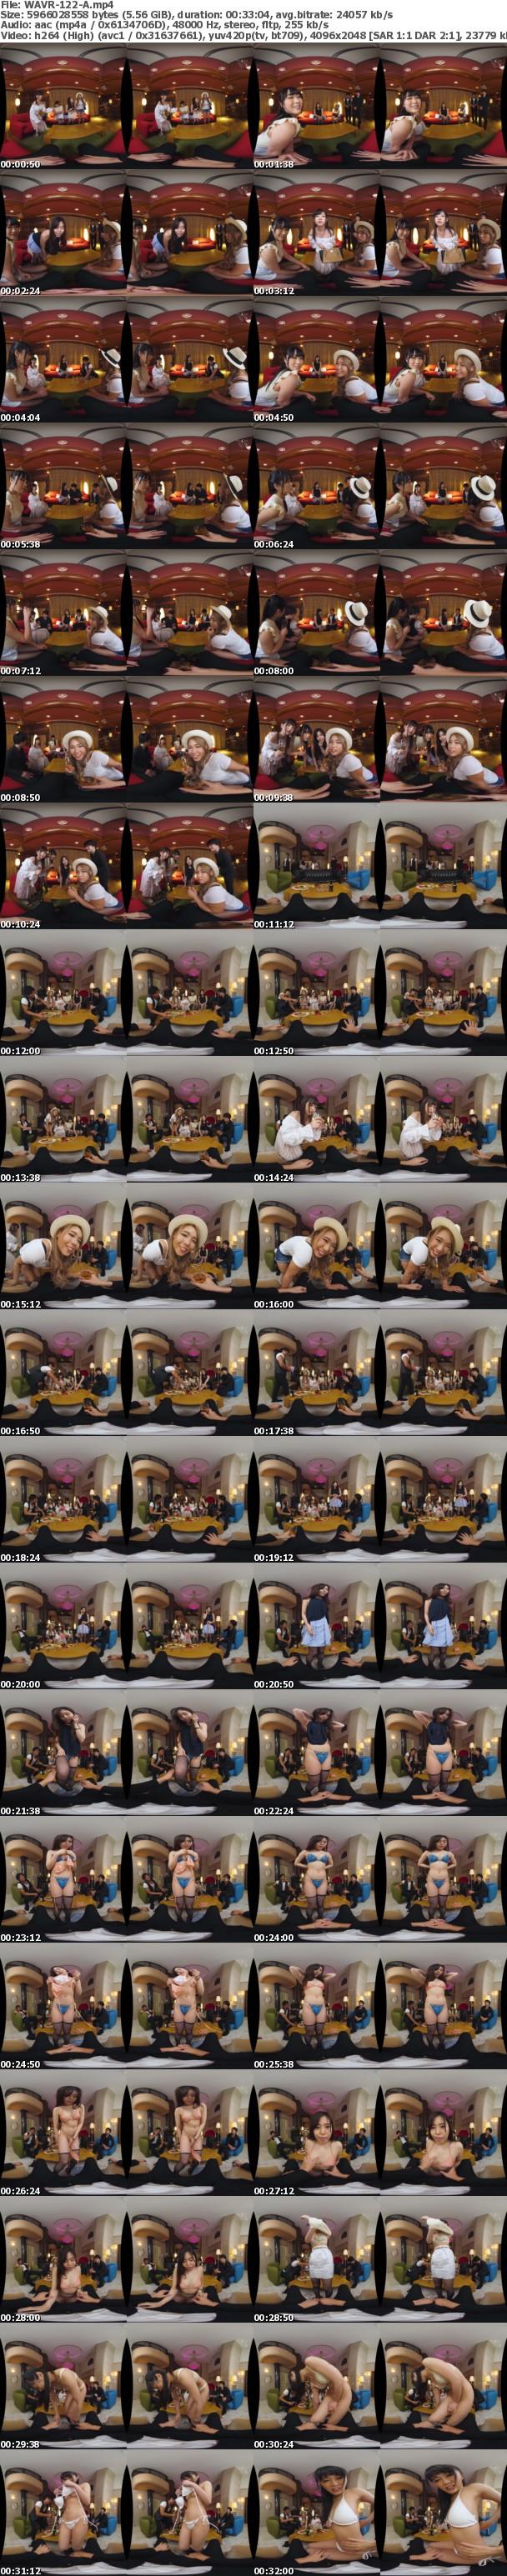 (VR) WAVR-122 私達どうしてもミス○○になりたいんです!! ミスキャンパス主催者に近づきカラダを売ってグランプリ受賞狙うゲスで最低なヤリマン軍団の最高に気持ちイイ性接待VR なりふり構わない就活女子のガチンコ枕営業